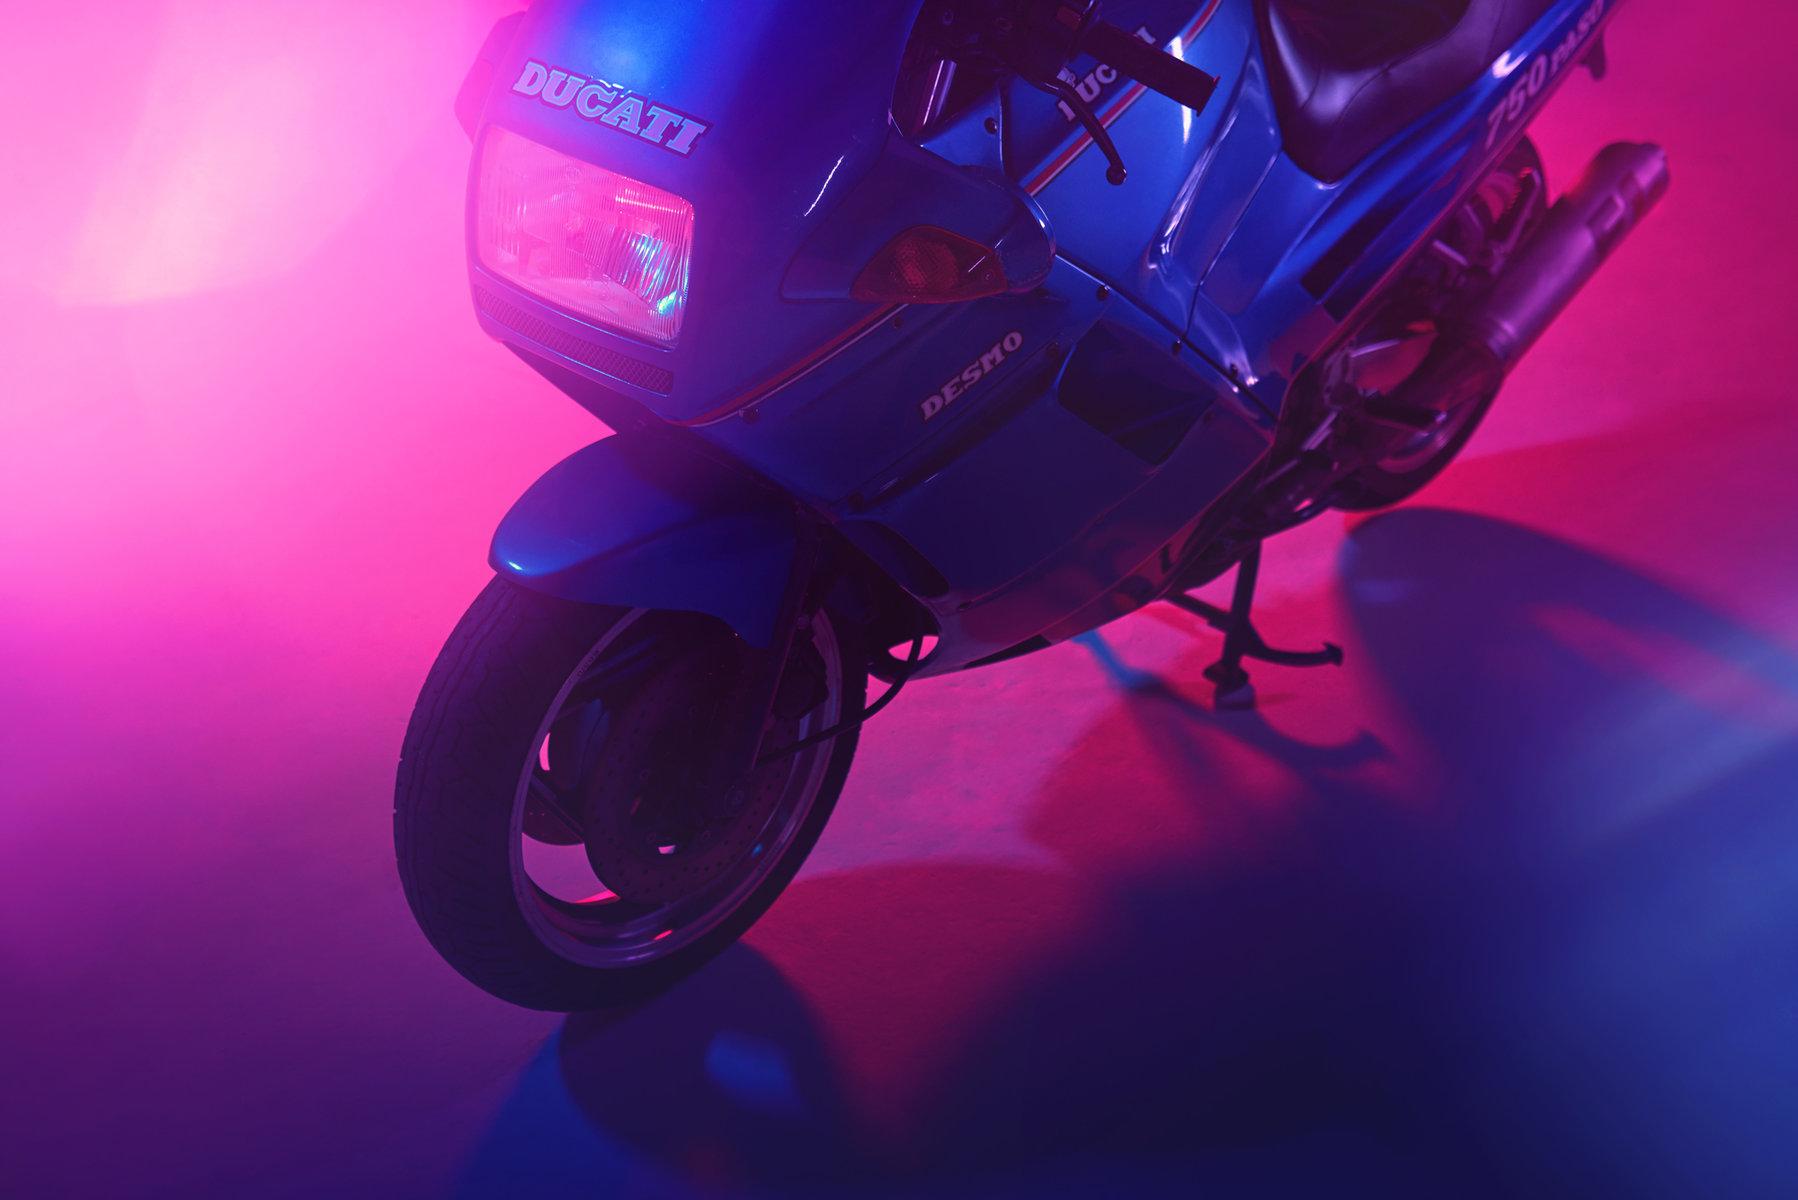 matthew-jones-ducati-paso-750-in-atlanta-ga-studio-11-2100089.jpg